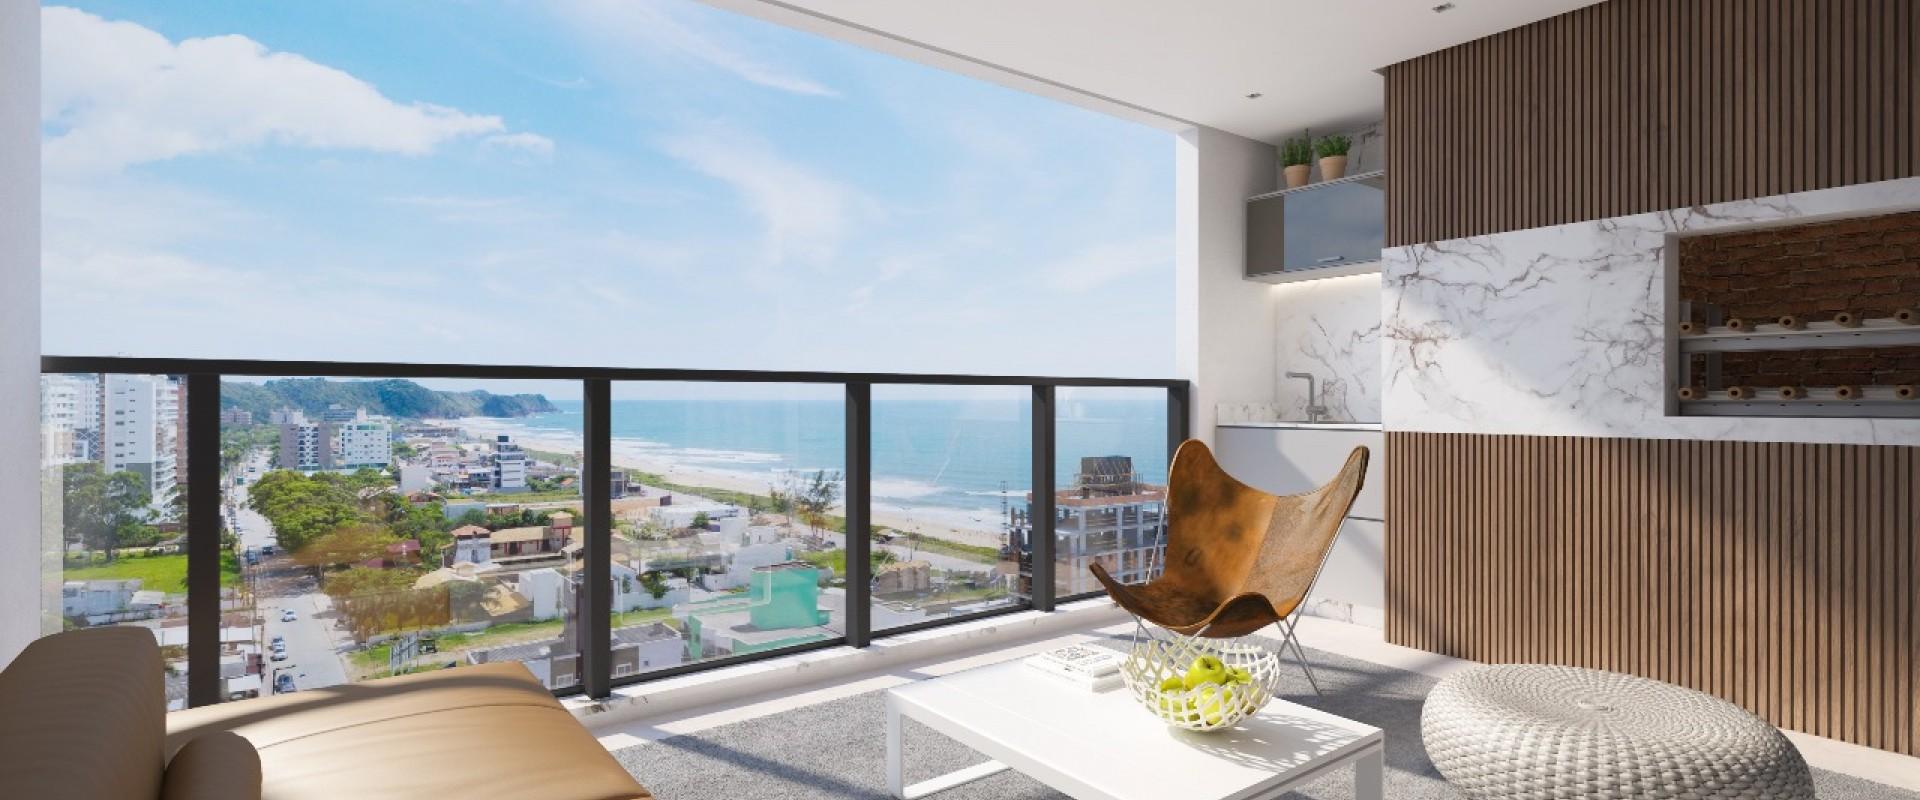 Ocean Wind Apartamento no Ocean Wind na Praia Brava em Itajaí